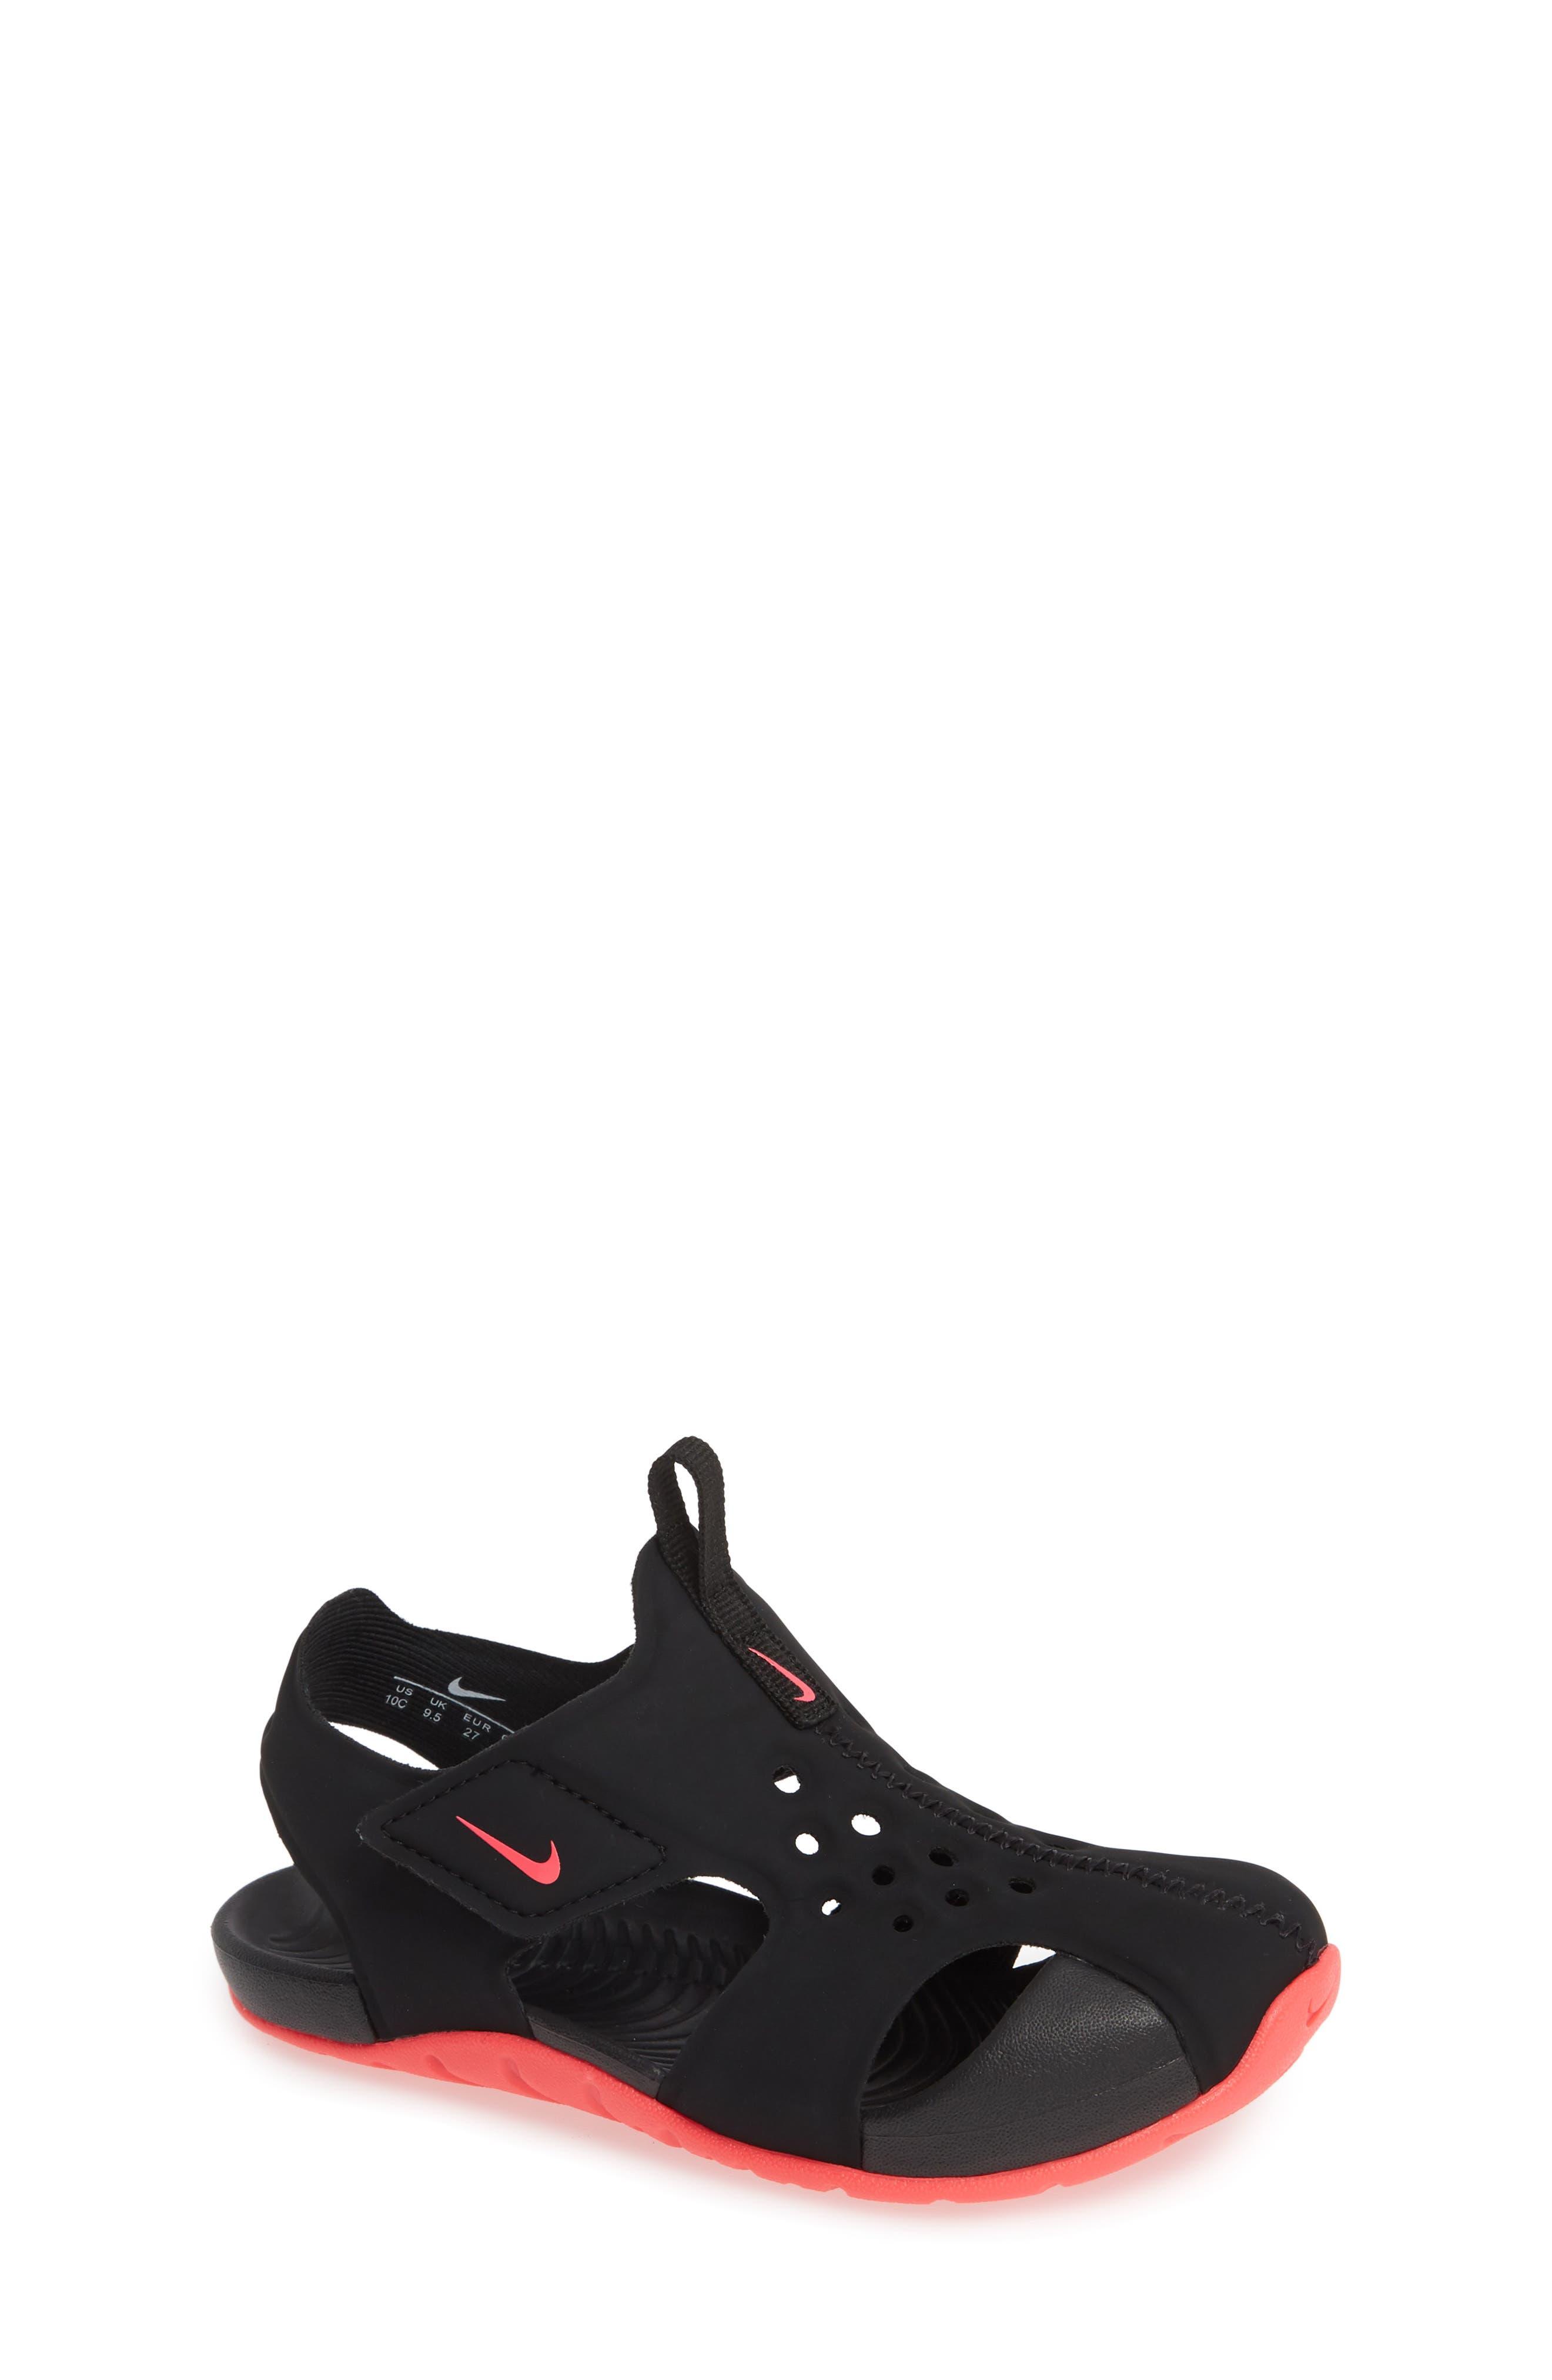 NIKE, Sunray Protect 2 Sandal, Main thumbnail 1, color, BLACK/ RACER PINK